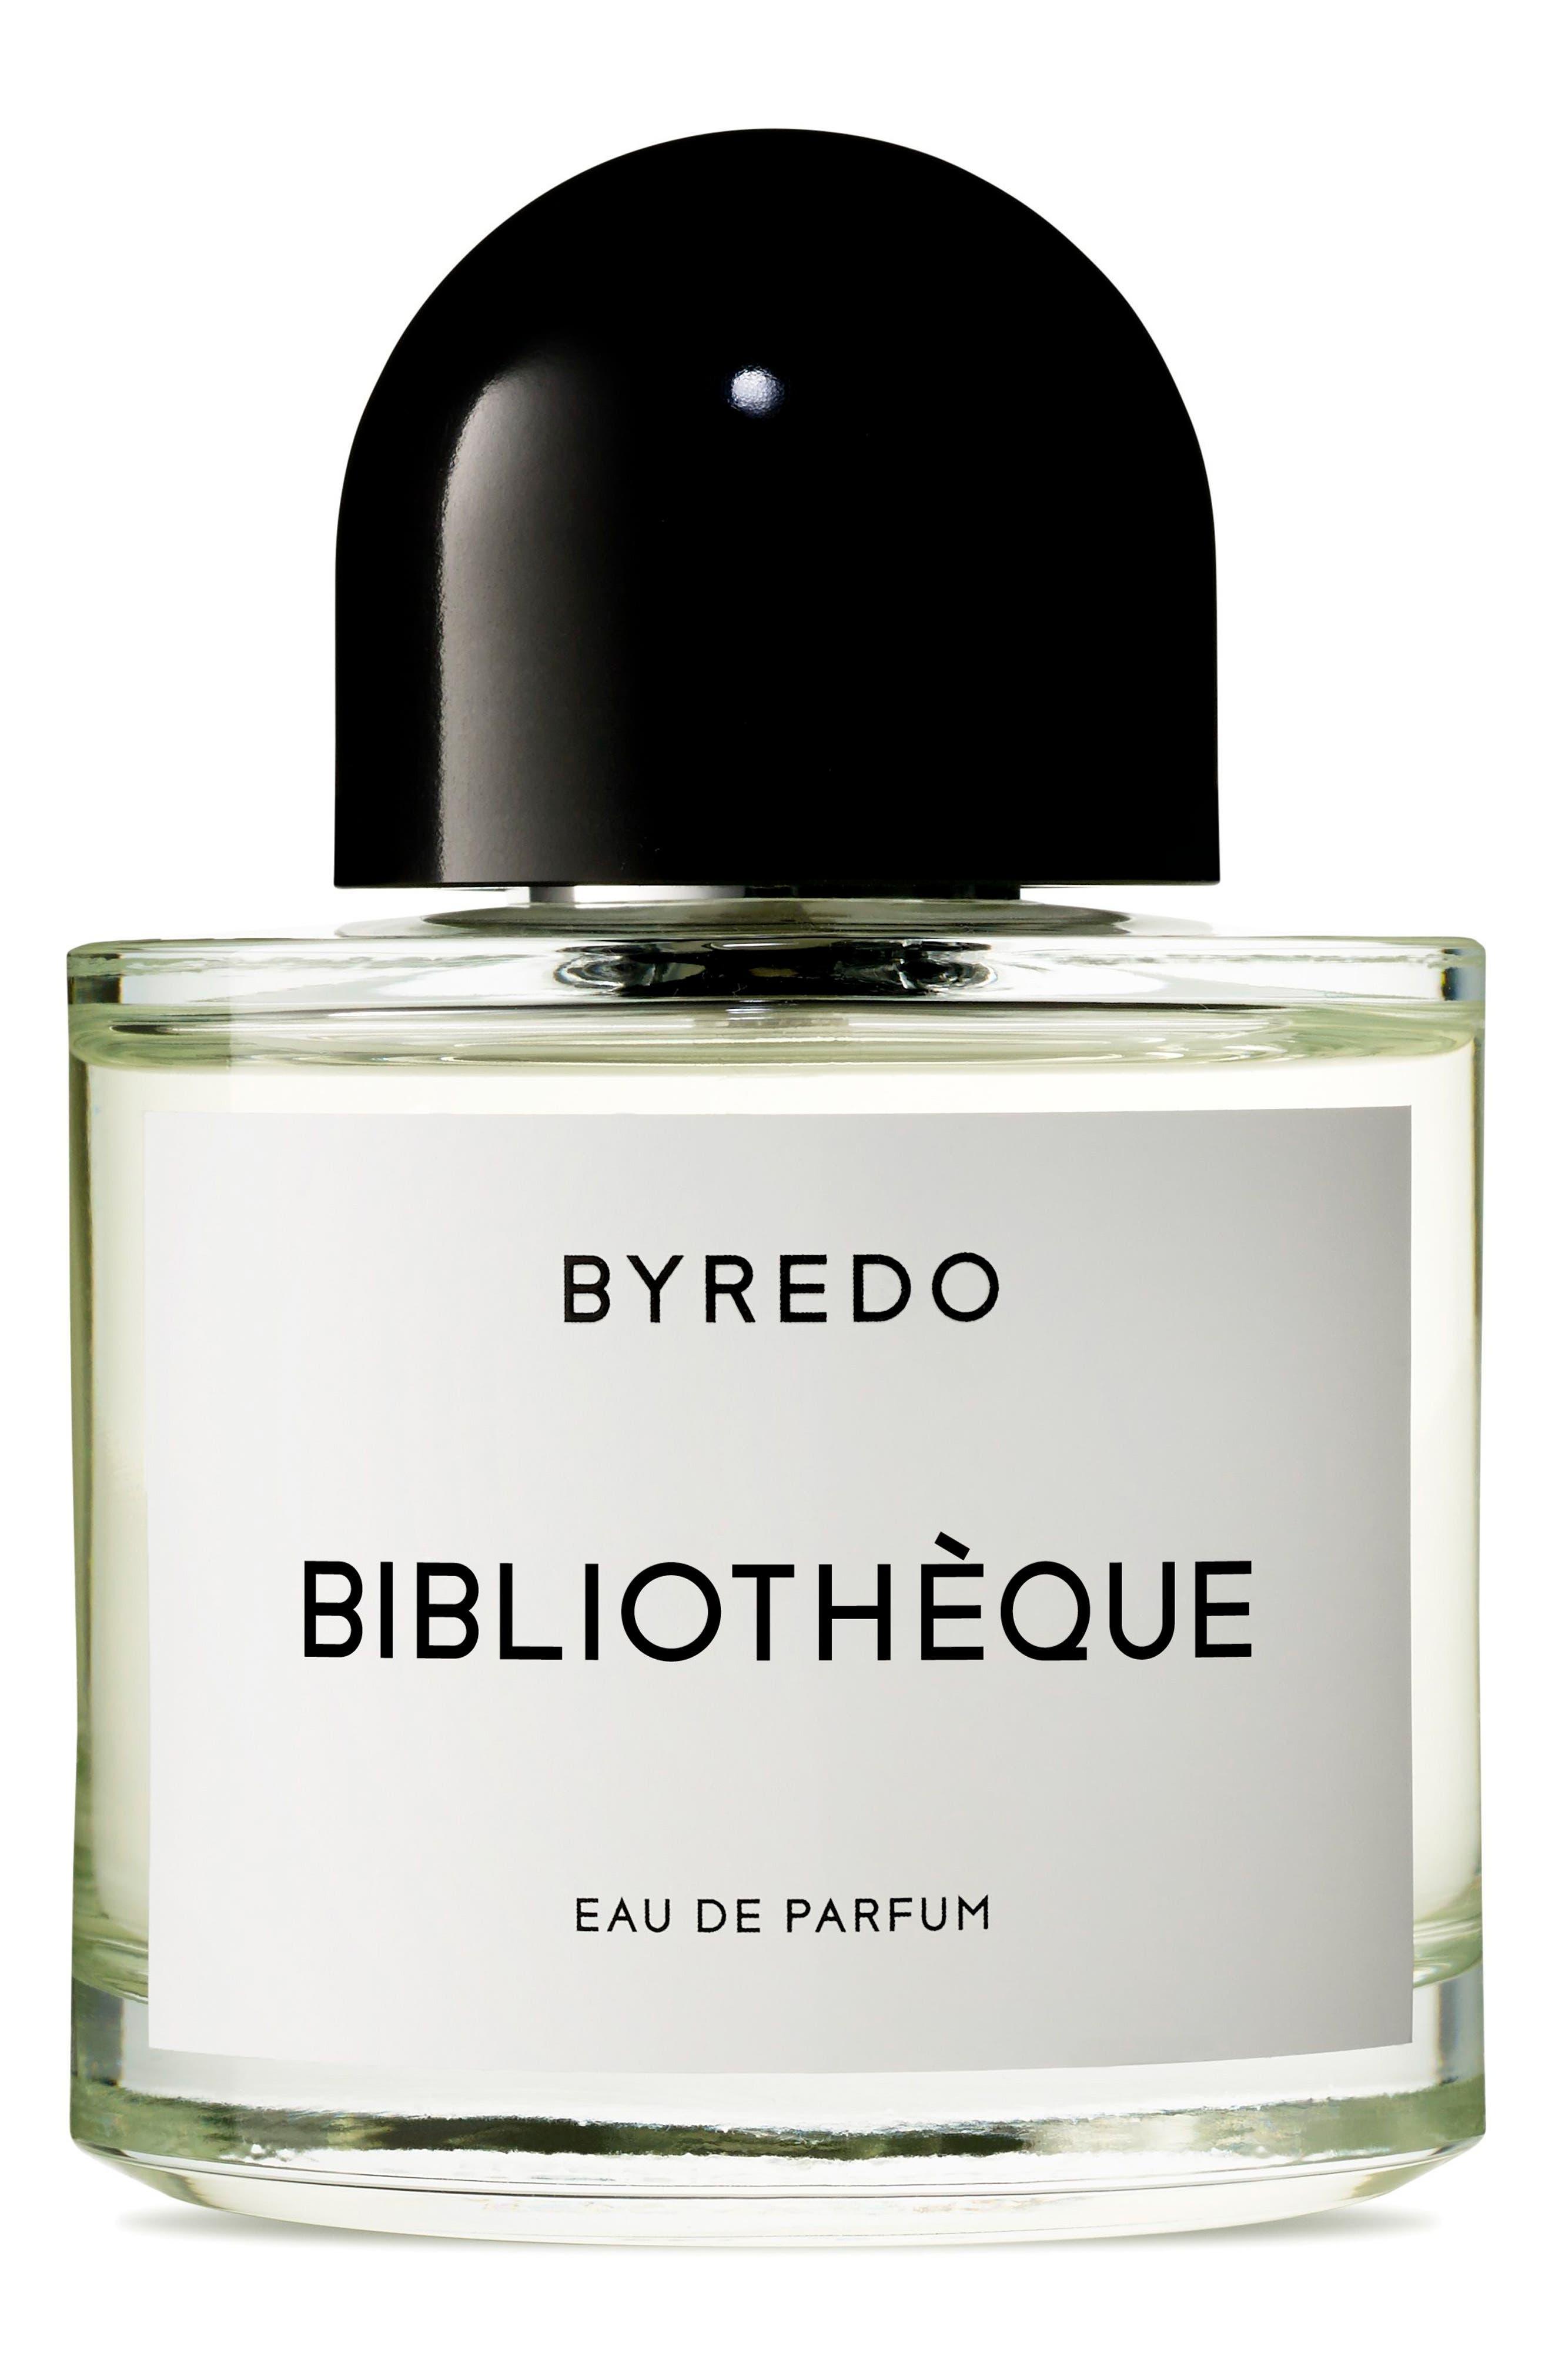 BYREDO Bibliotheque Eau de Parfum